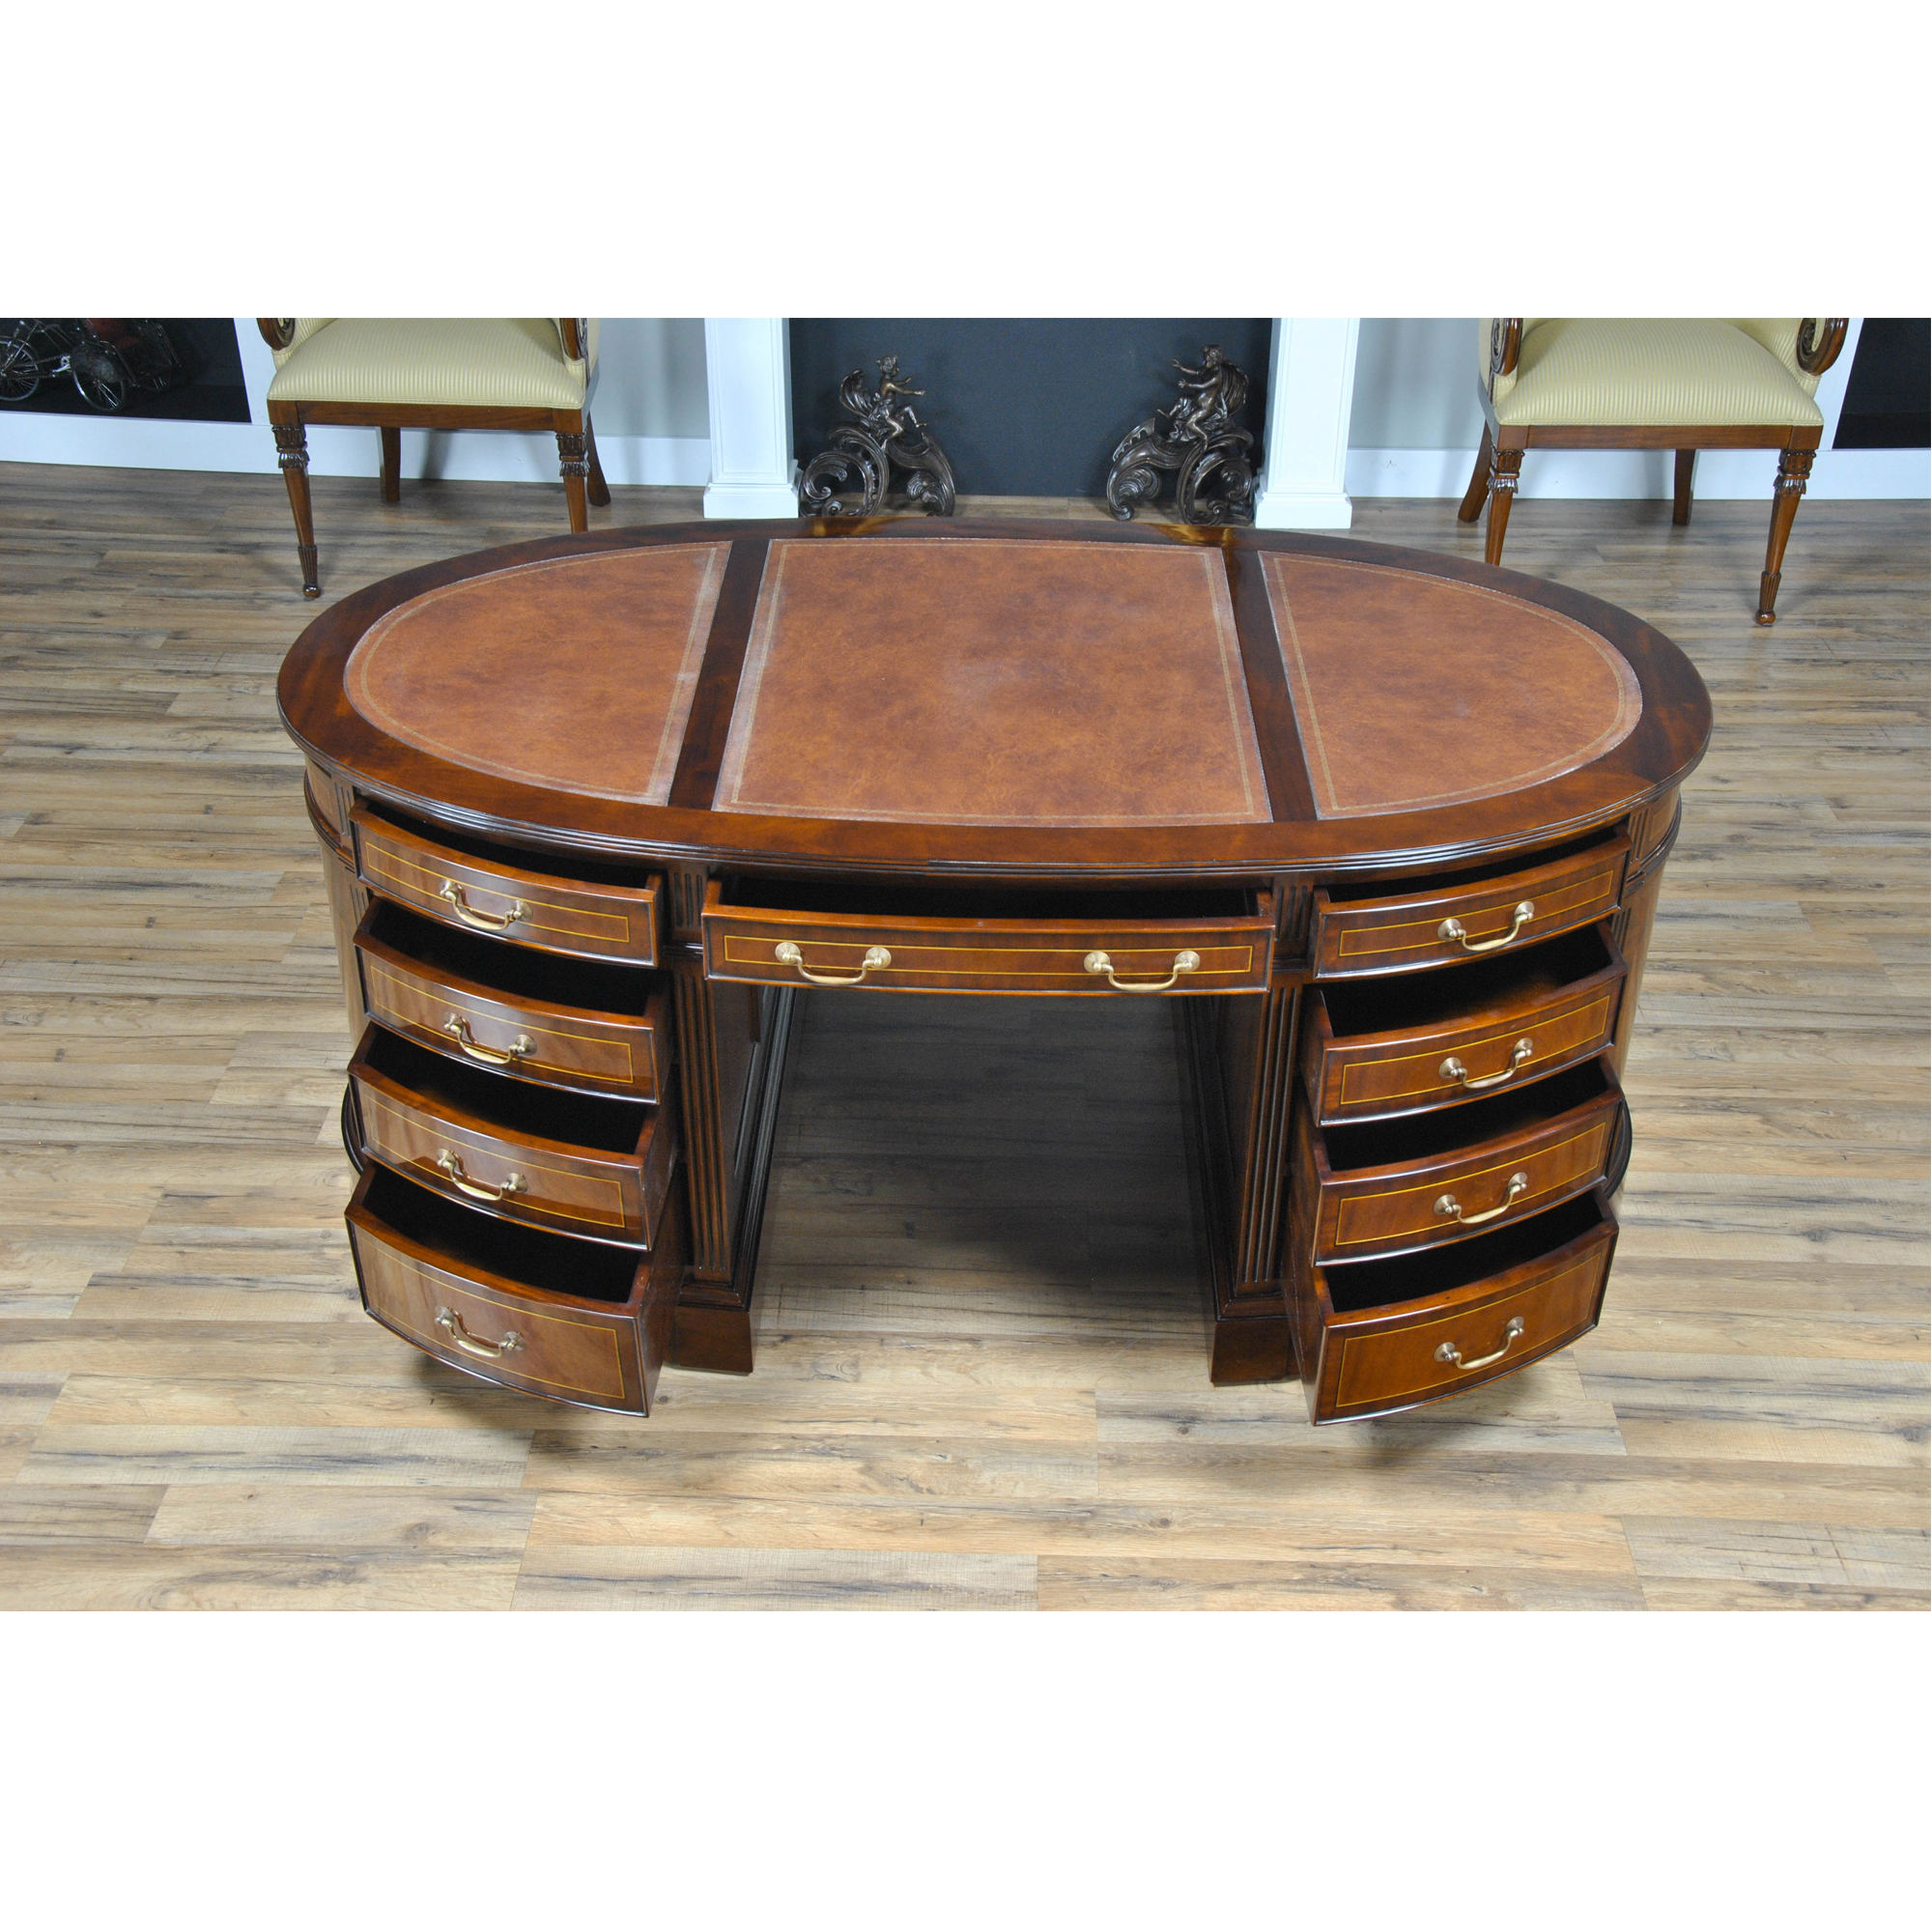 Oval Partners Desk Niagara Furniture leather top partner